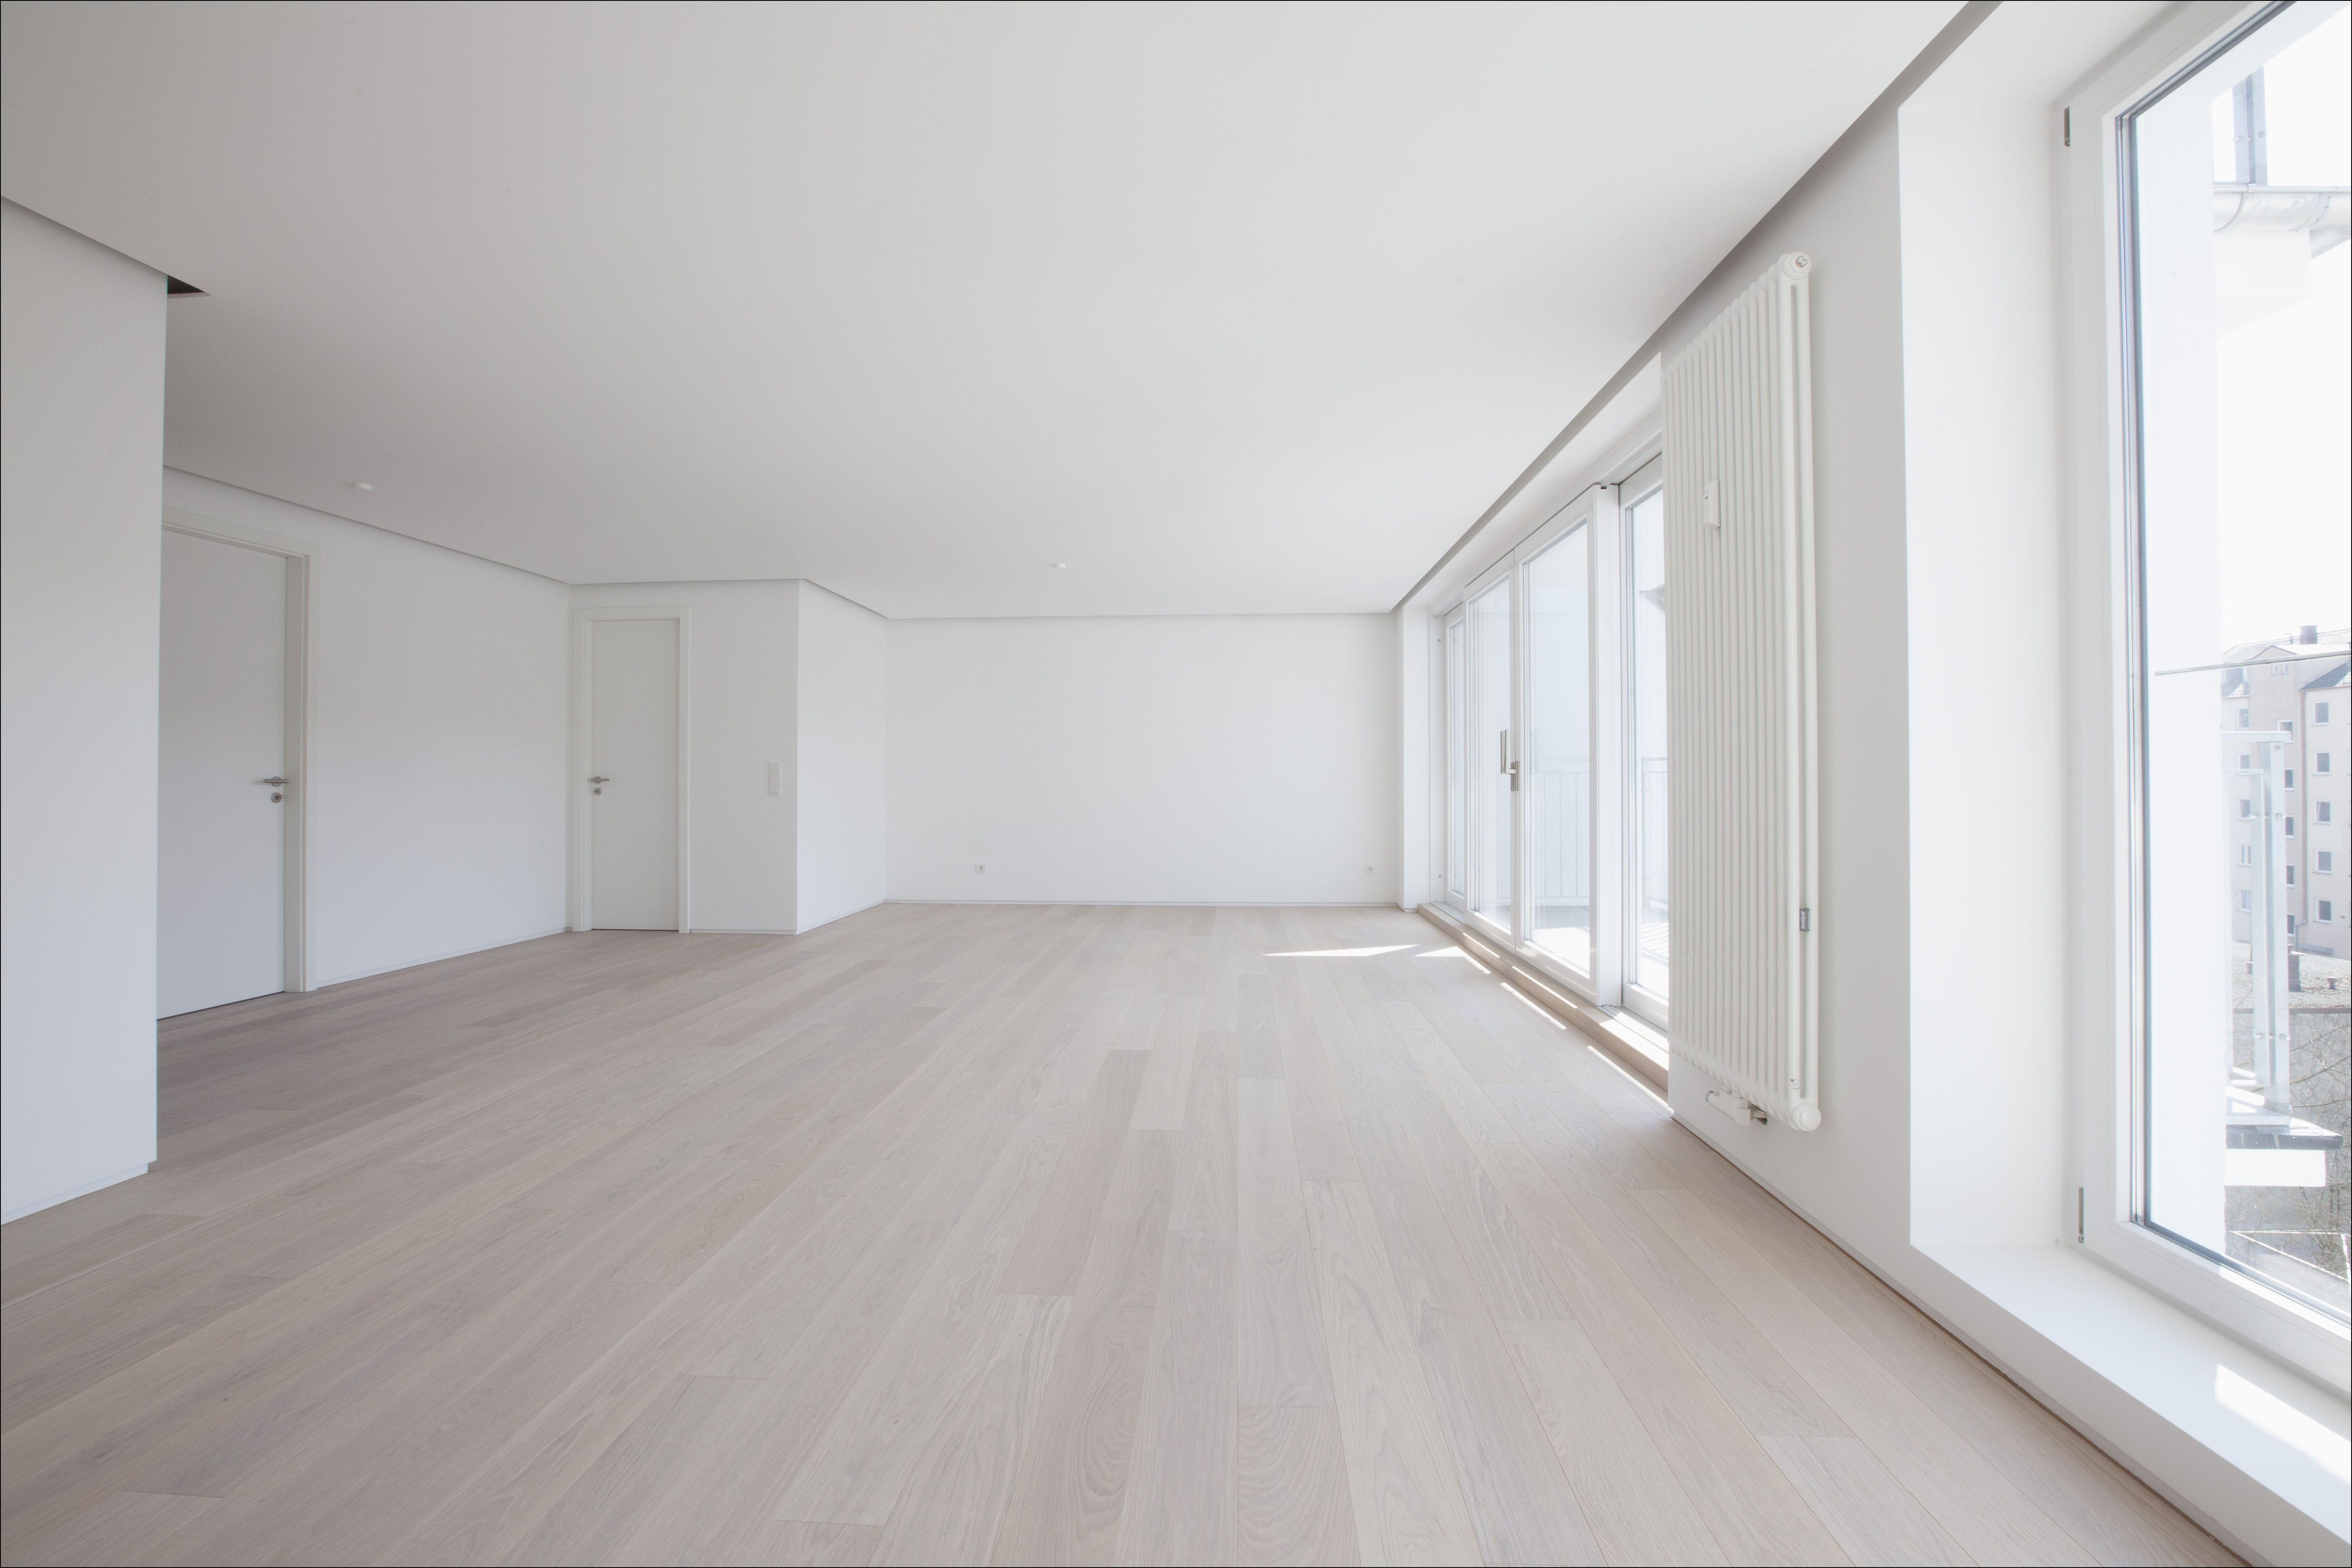 cleaning mohawk engineered hardwood floors of best place flooring ideas regarding best place to buy engineered hardwood flooring images basics favorite hybrid engineered wood floors of best